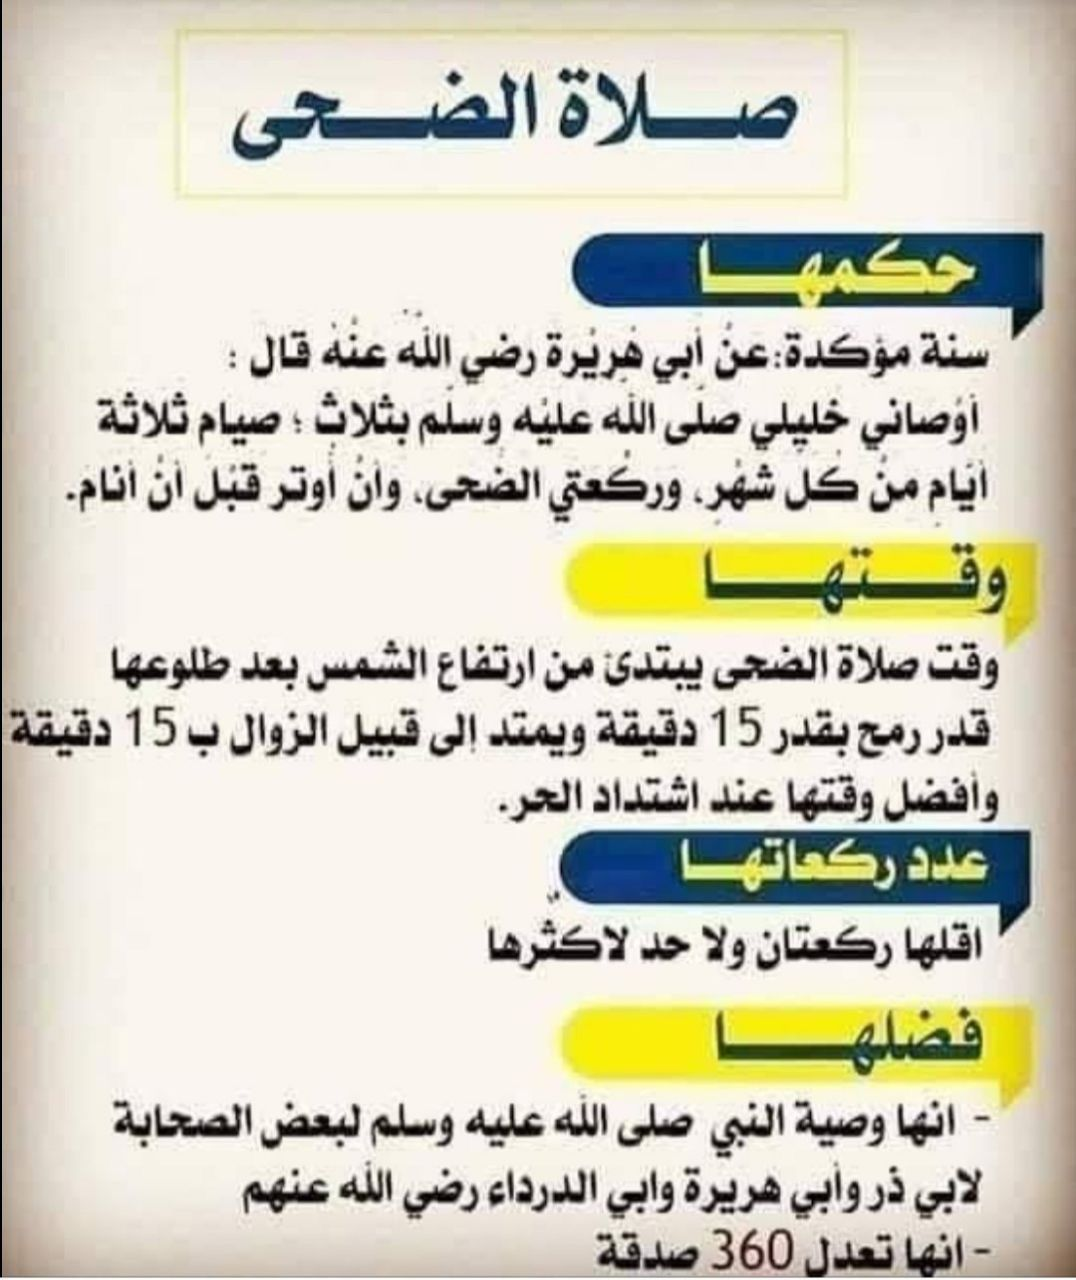 Pin By خليفه On اذكارات Islam Beliefs Islamic Teachings Duaa Islam